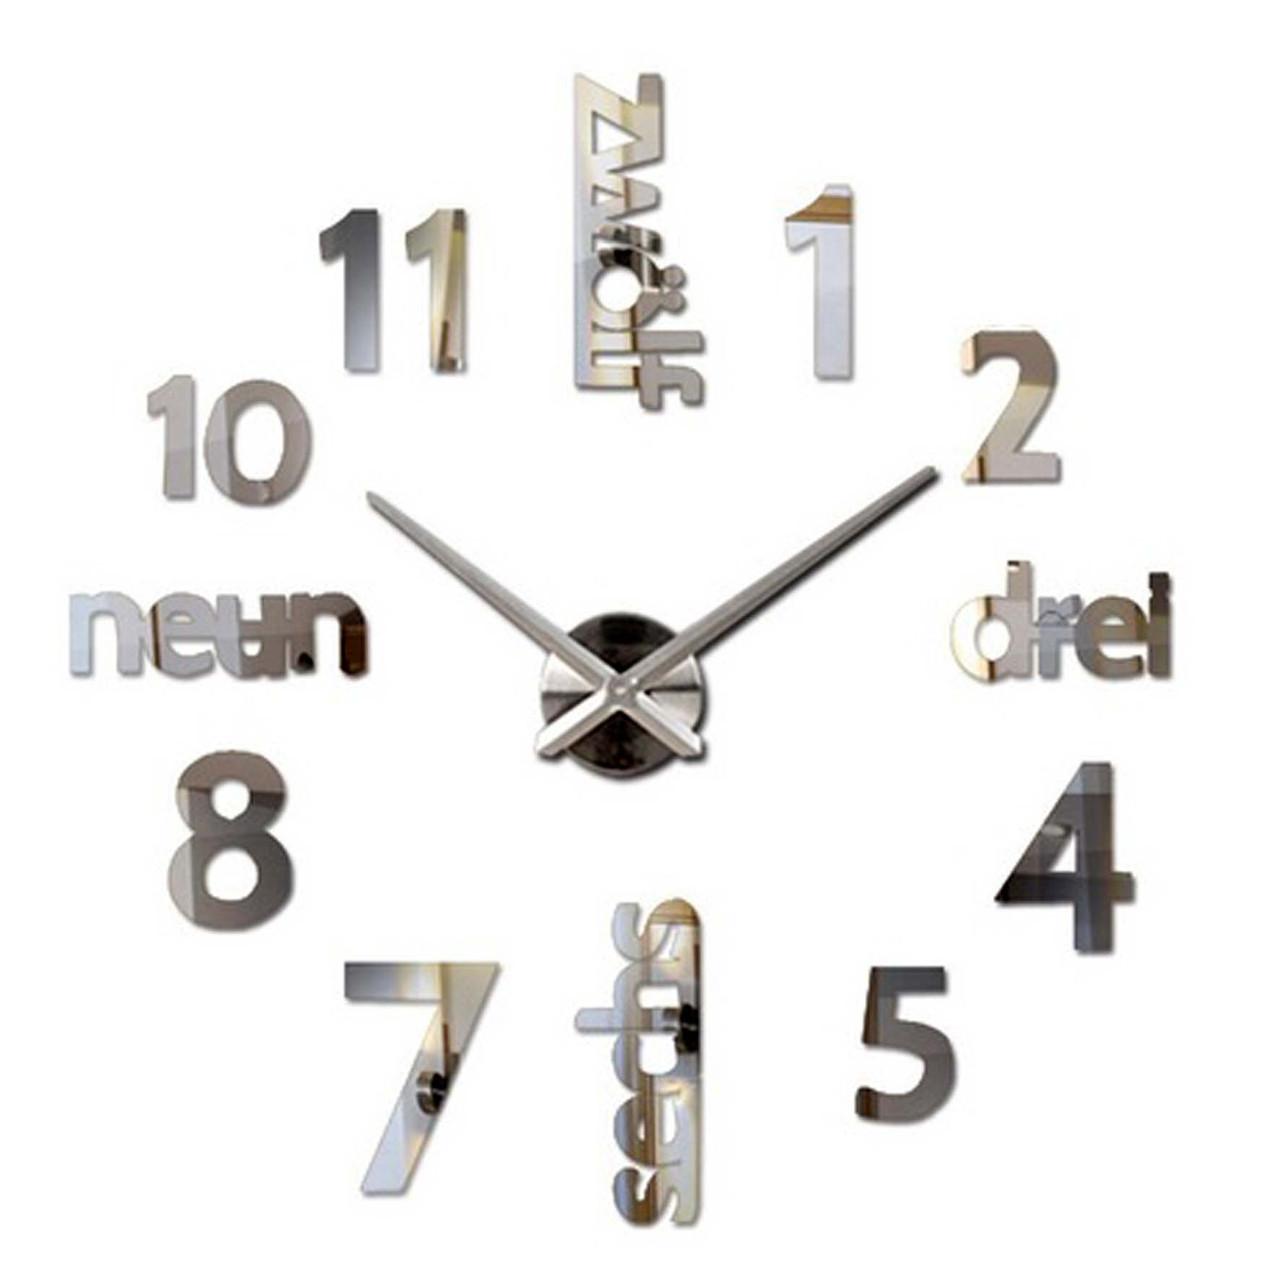 "Настінні годинники 3D Великі ""Zeit"" - годинник наклейка з дзеркальним ефектом, незвичайні настінні 3Д годинник стікери"